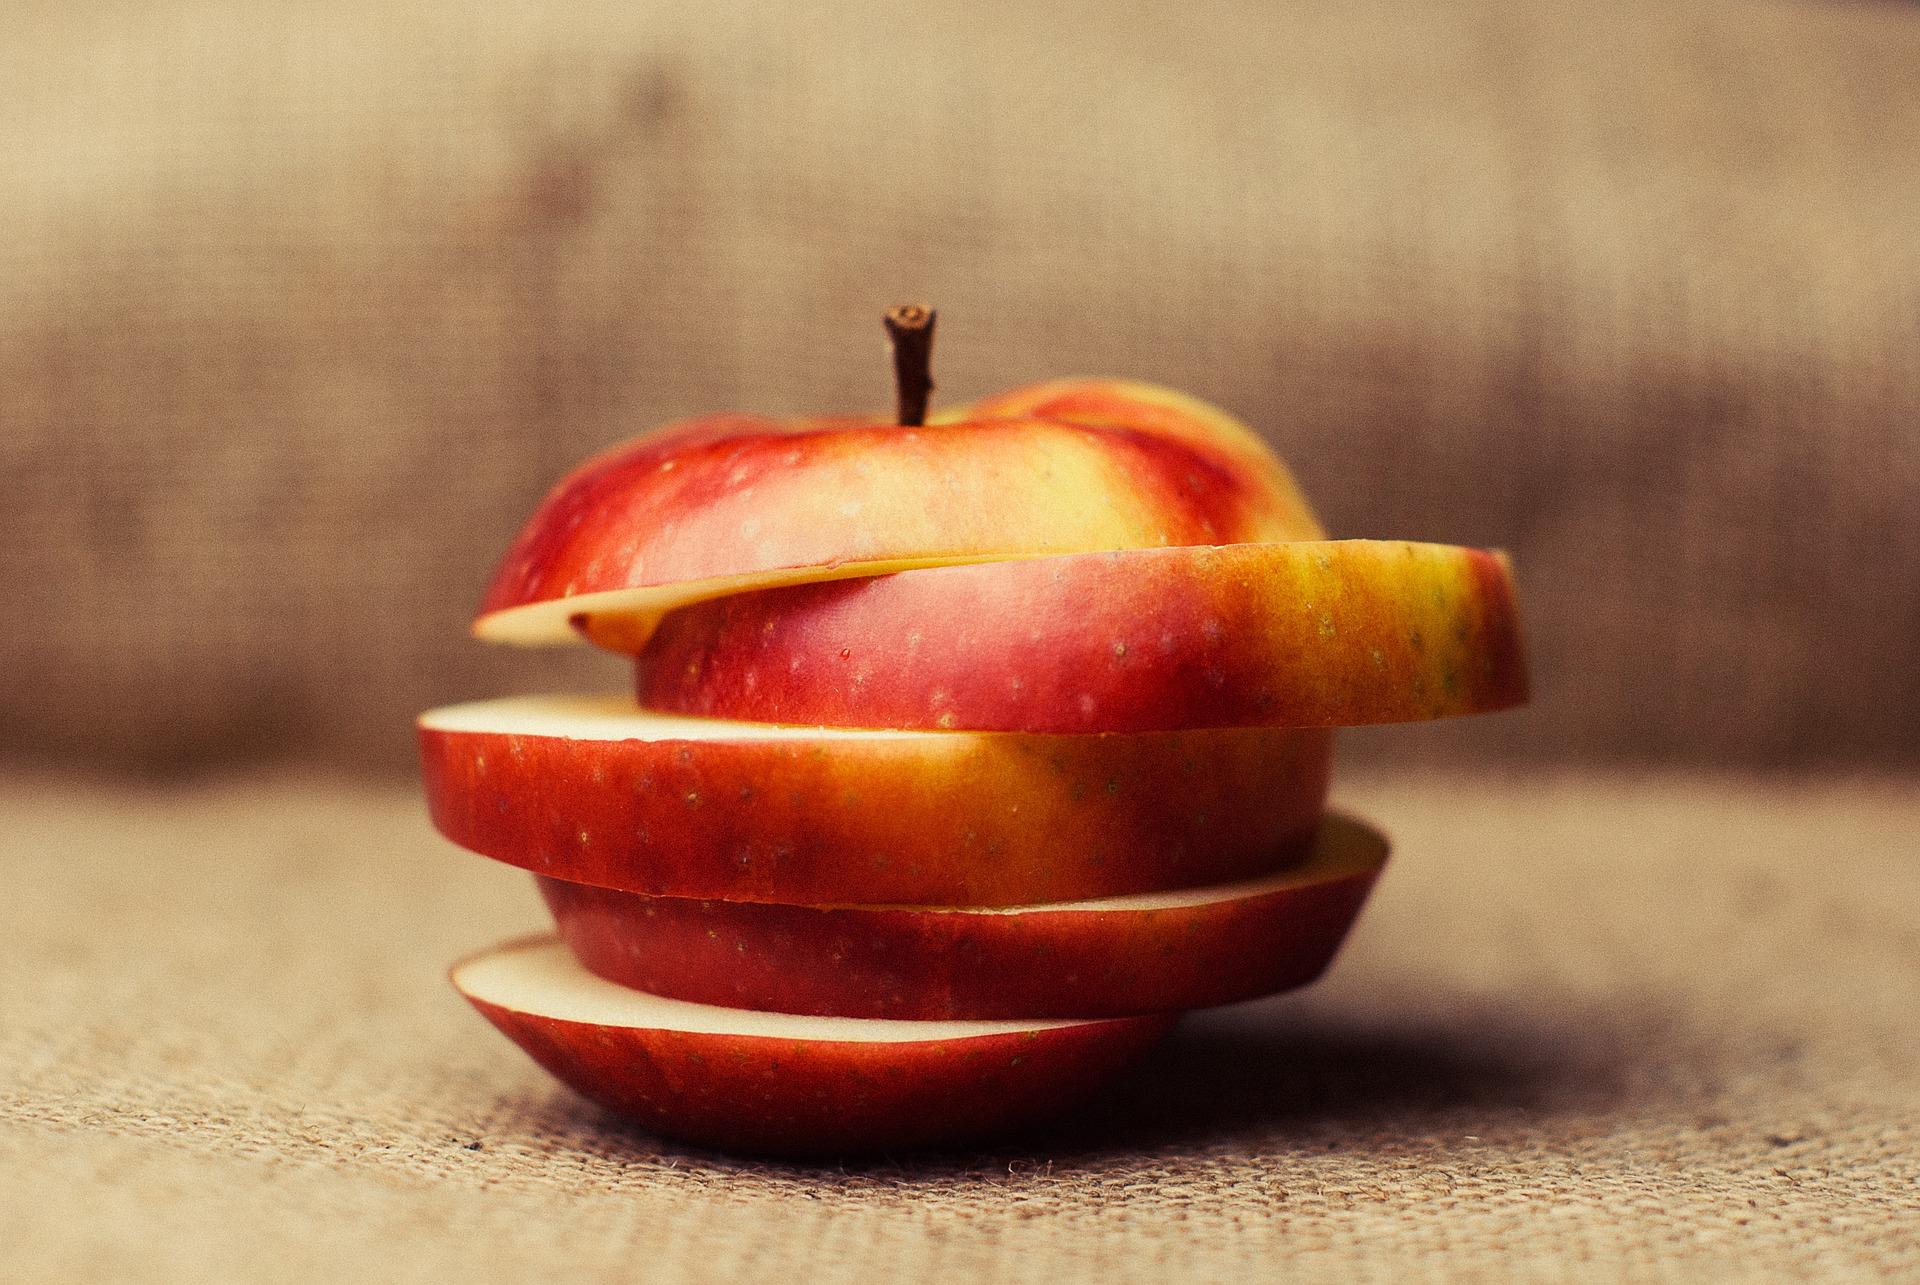 apple-2619318_1920